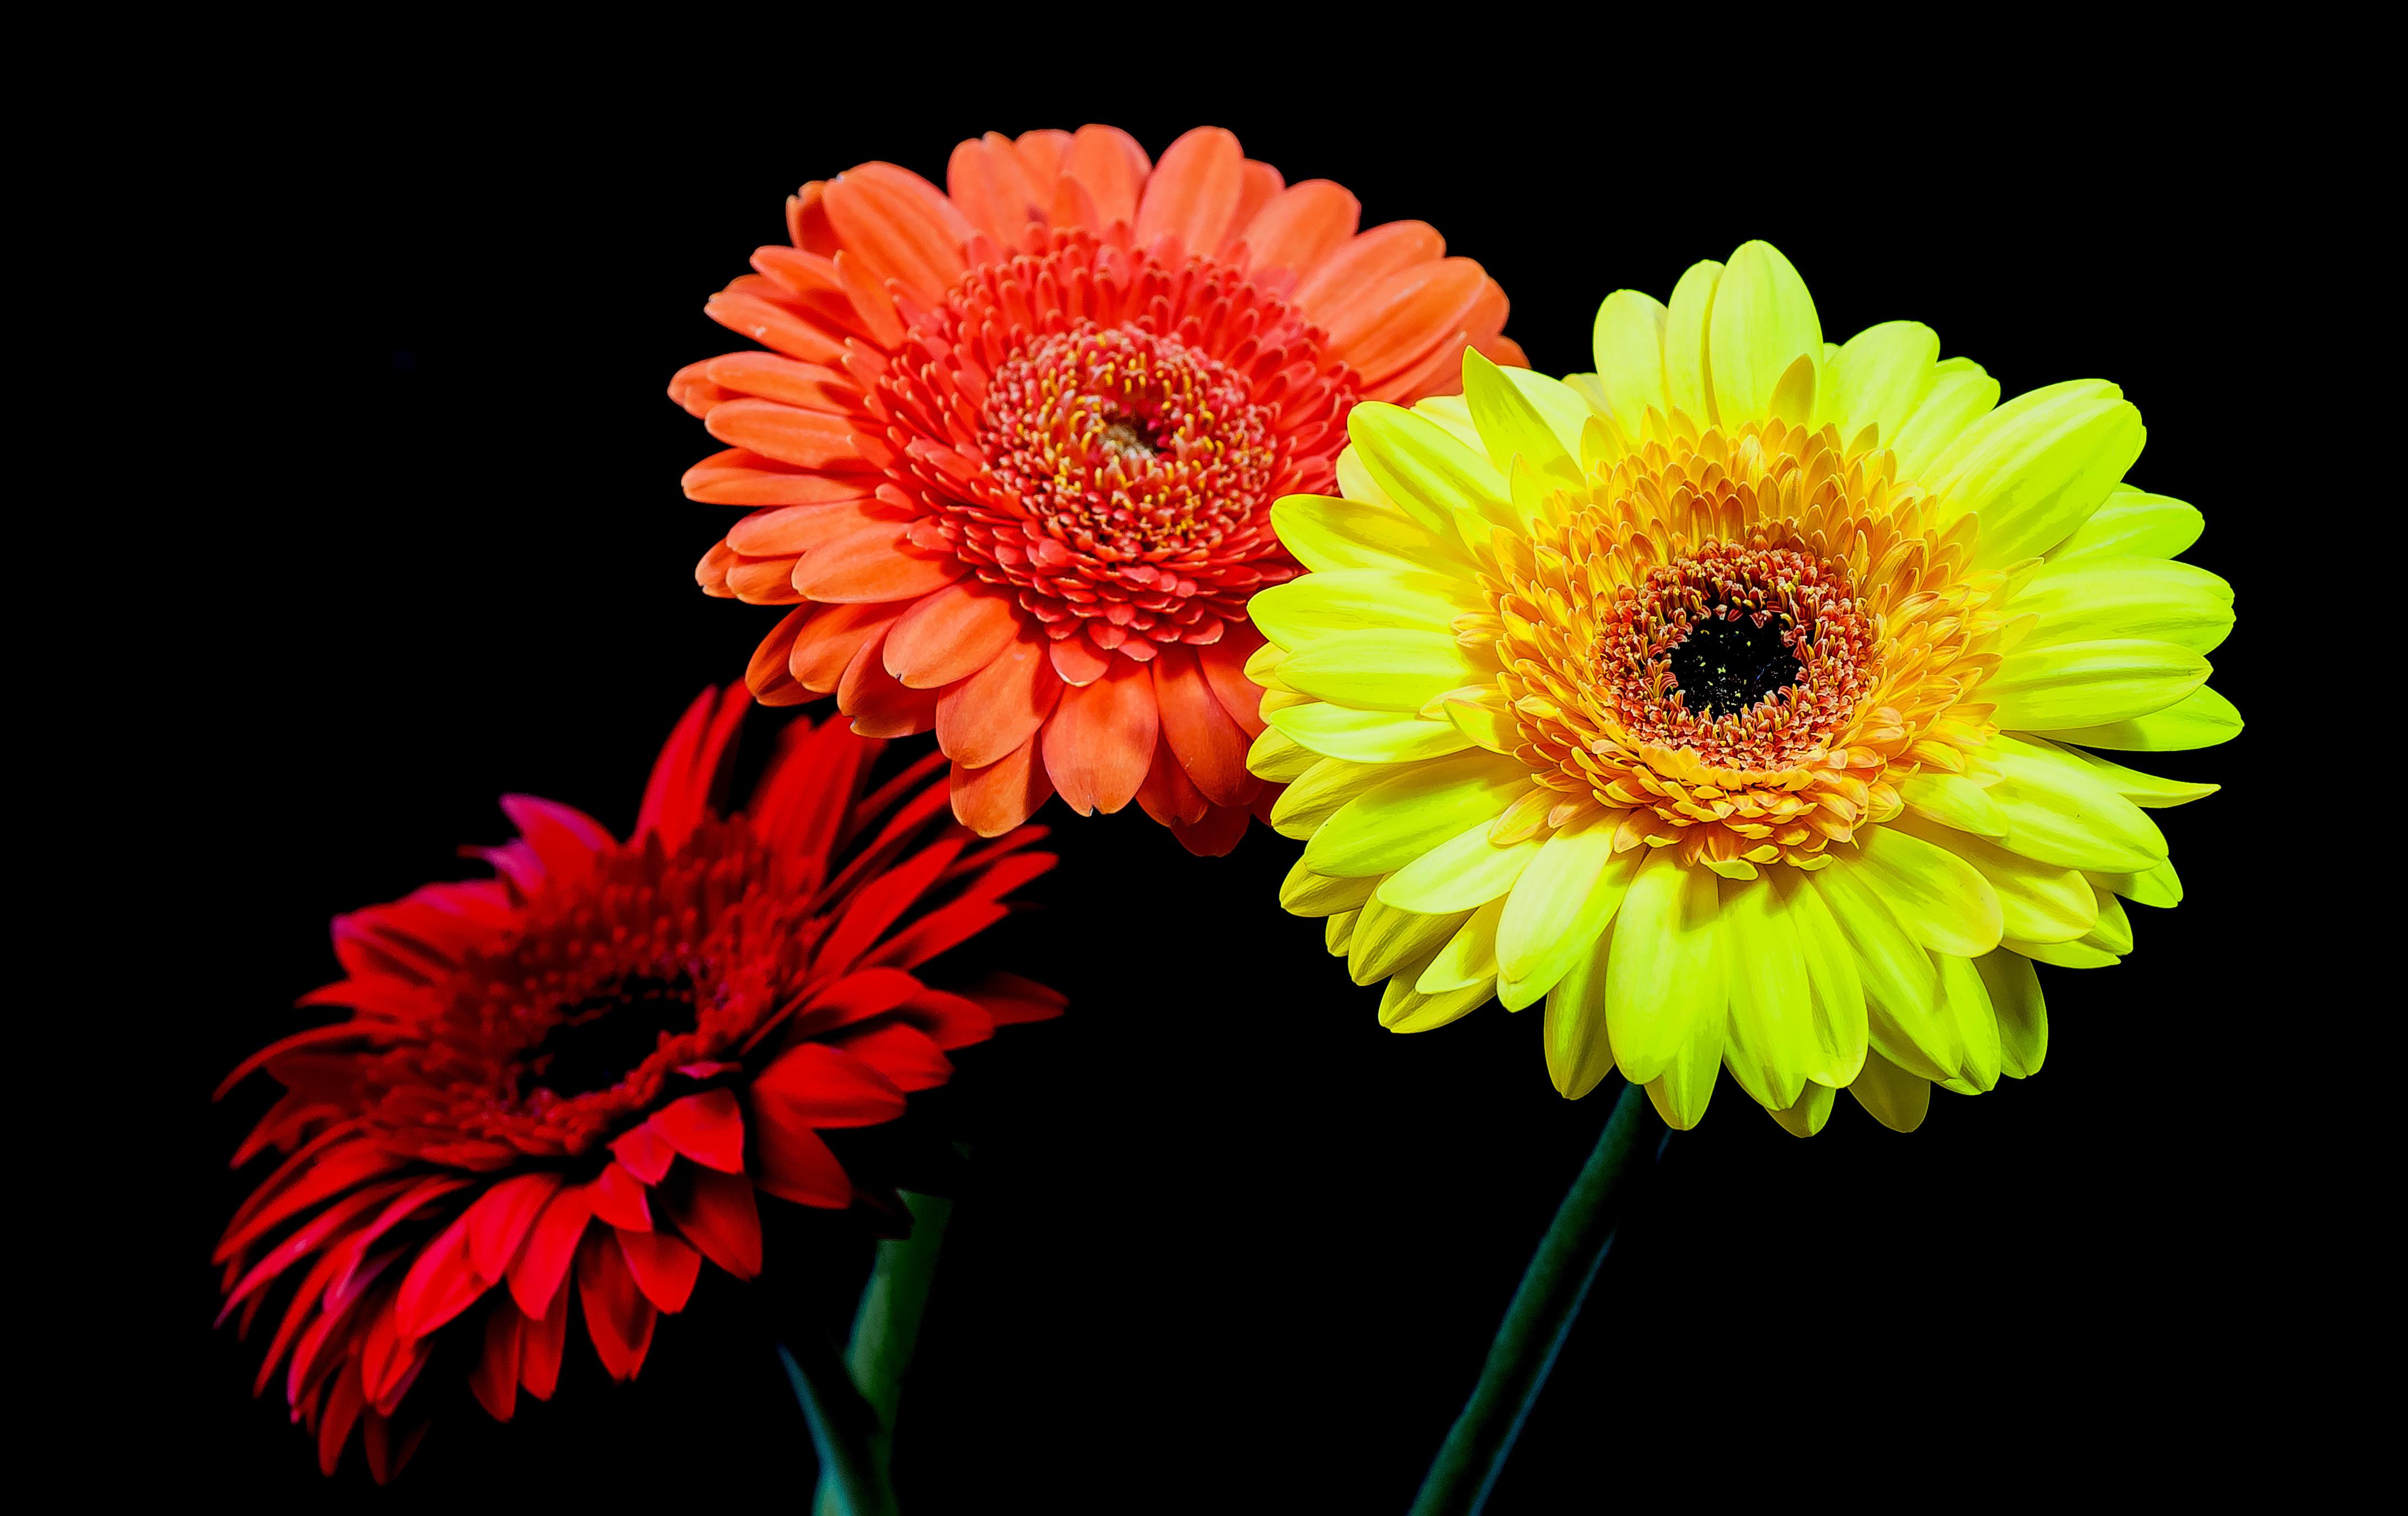 Картинка три цветка на черном фоне маркты обычно